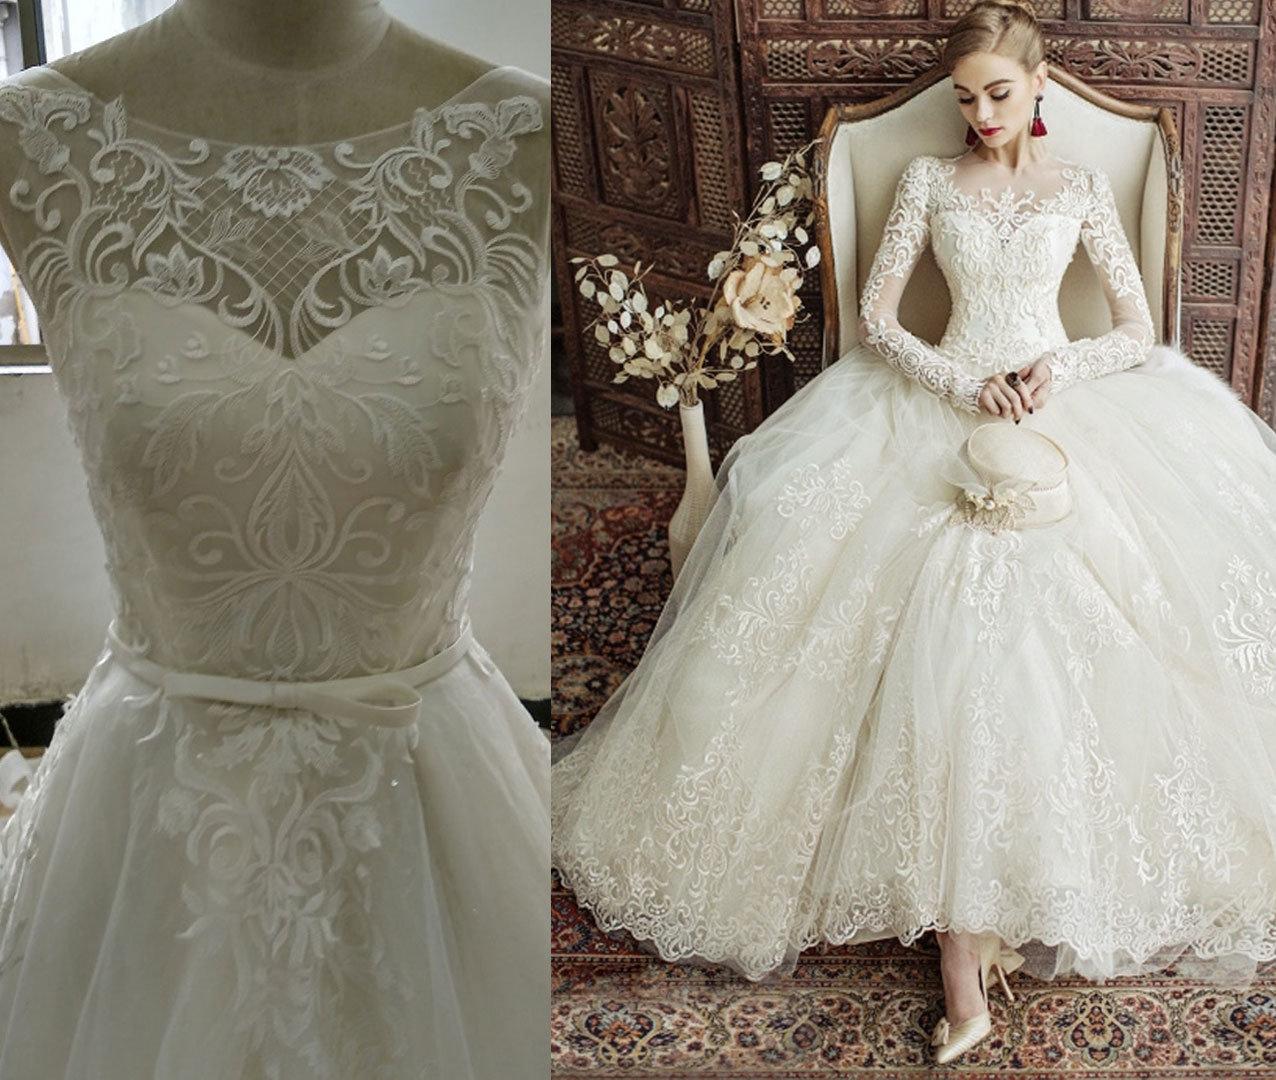 Princess Boat Neckline Sleeveless Wedding Dress